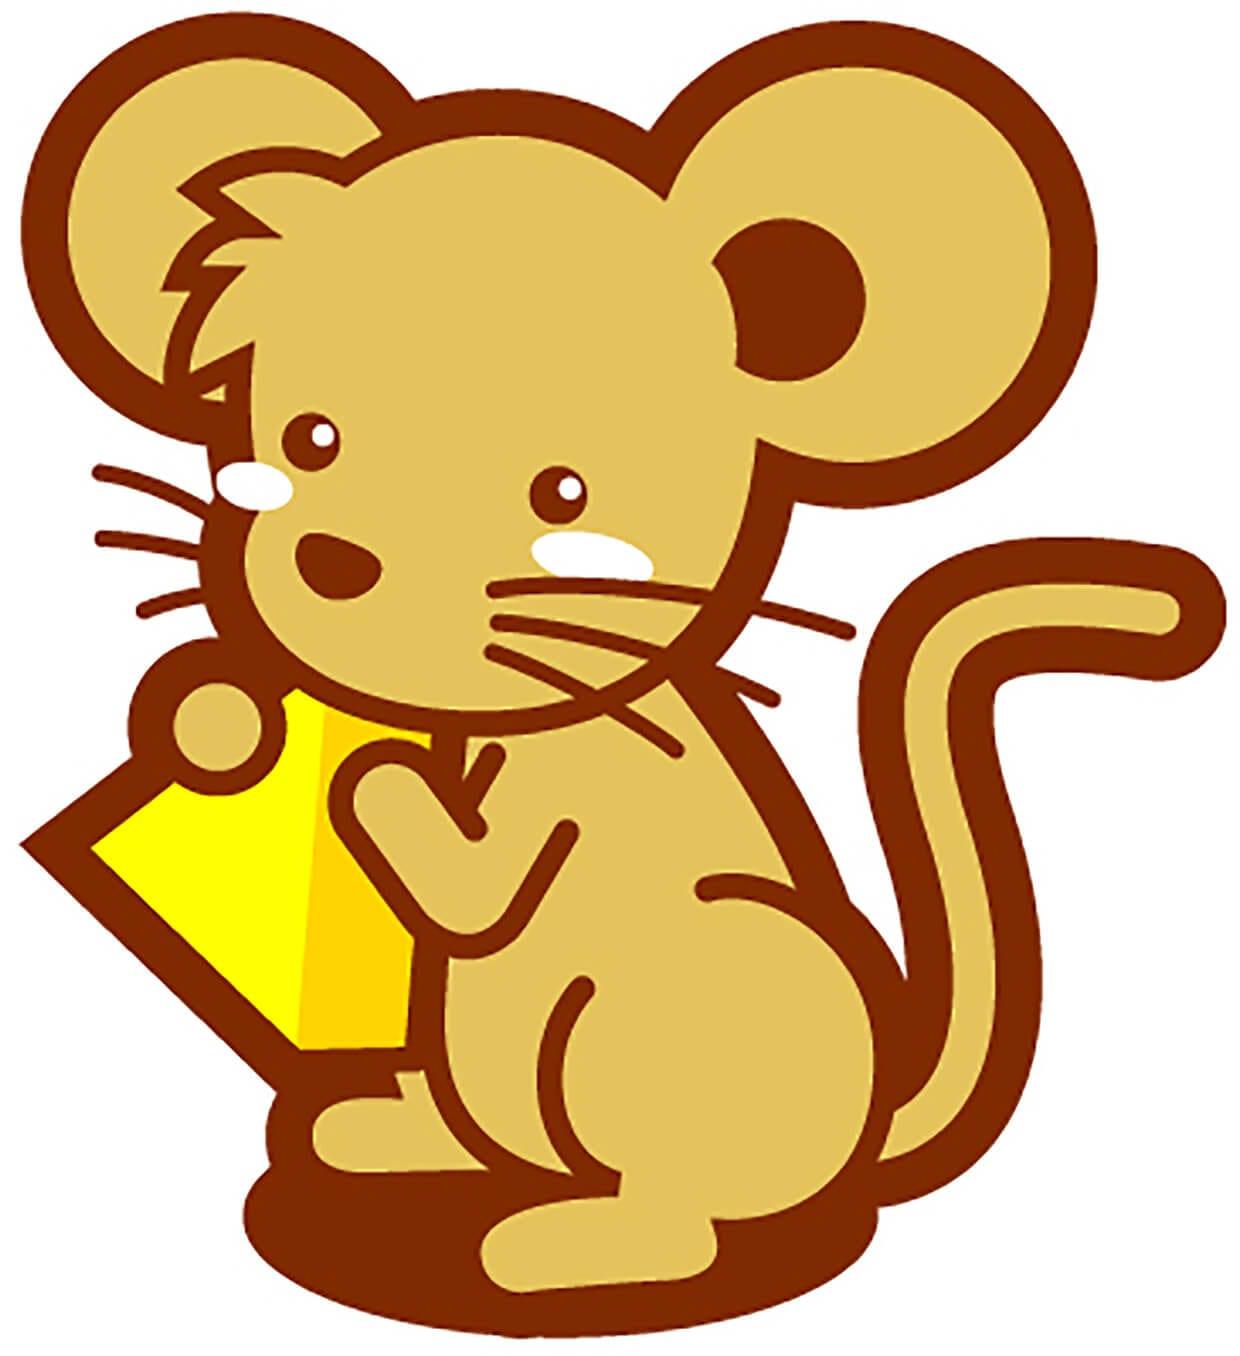 Мышка с сыром картинка 3